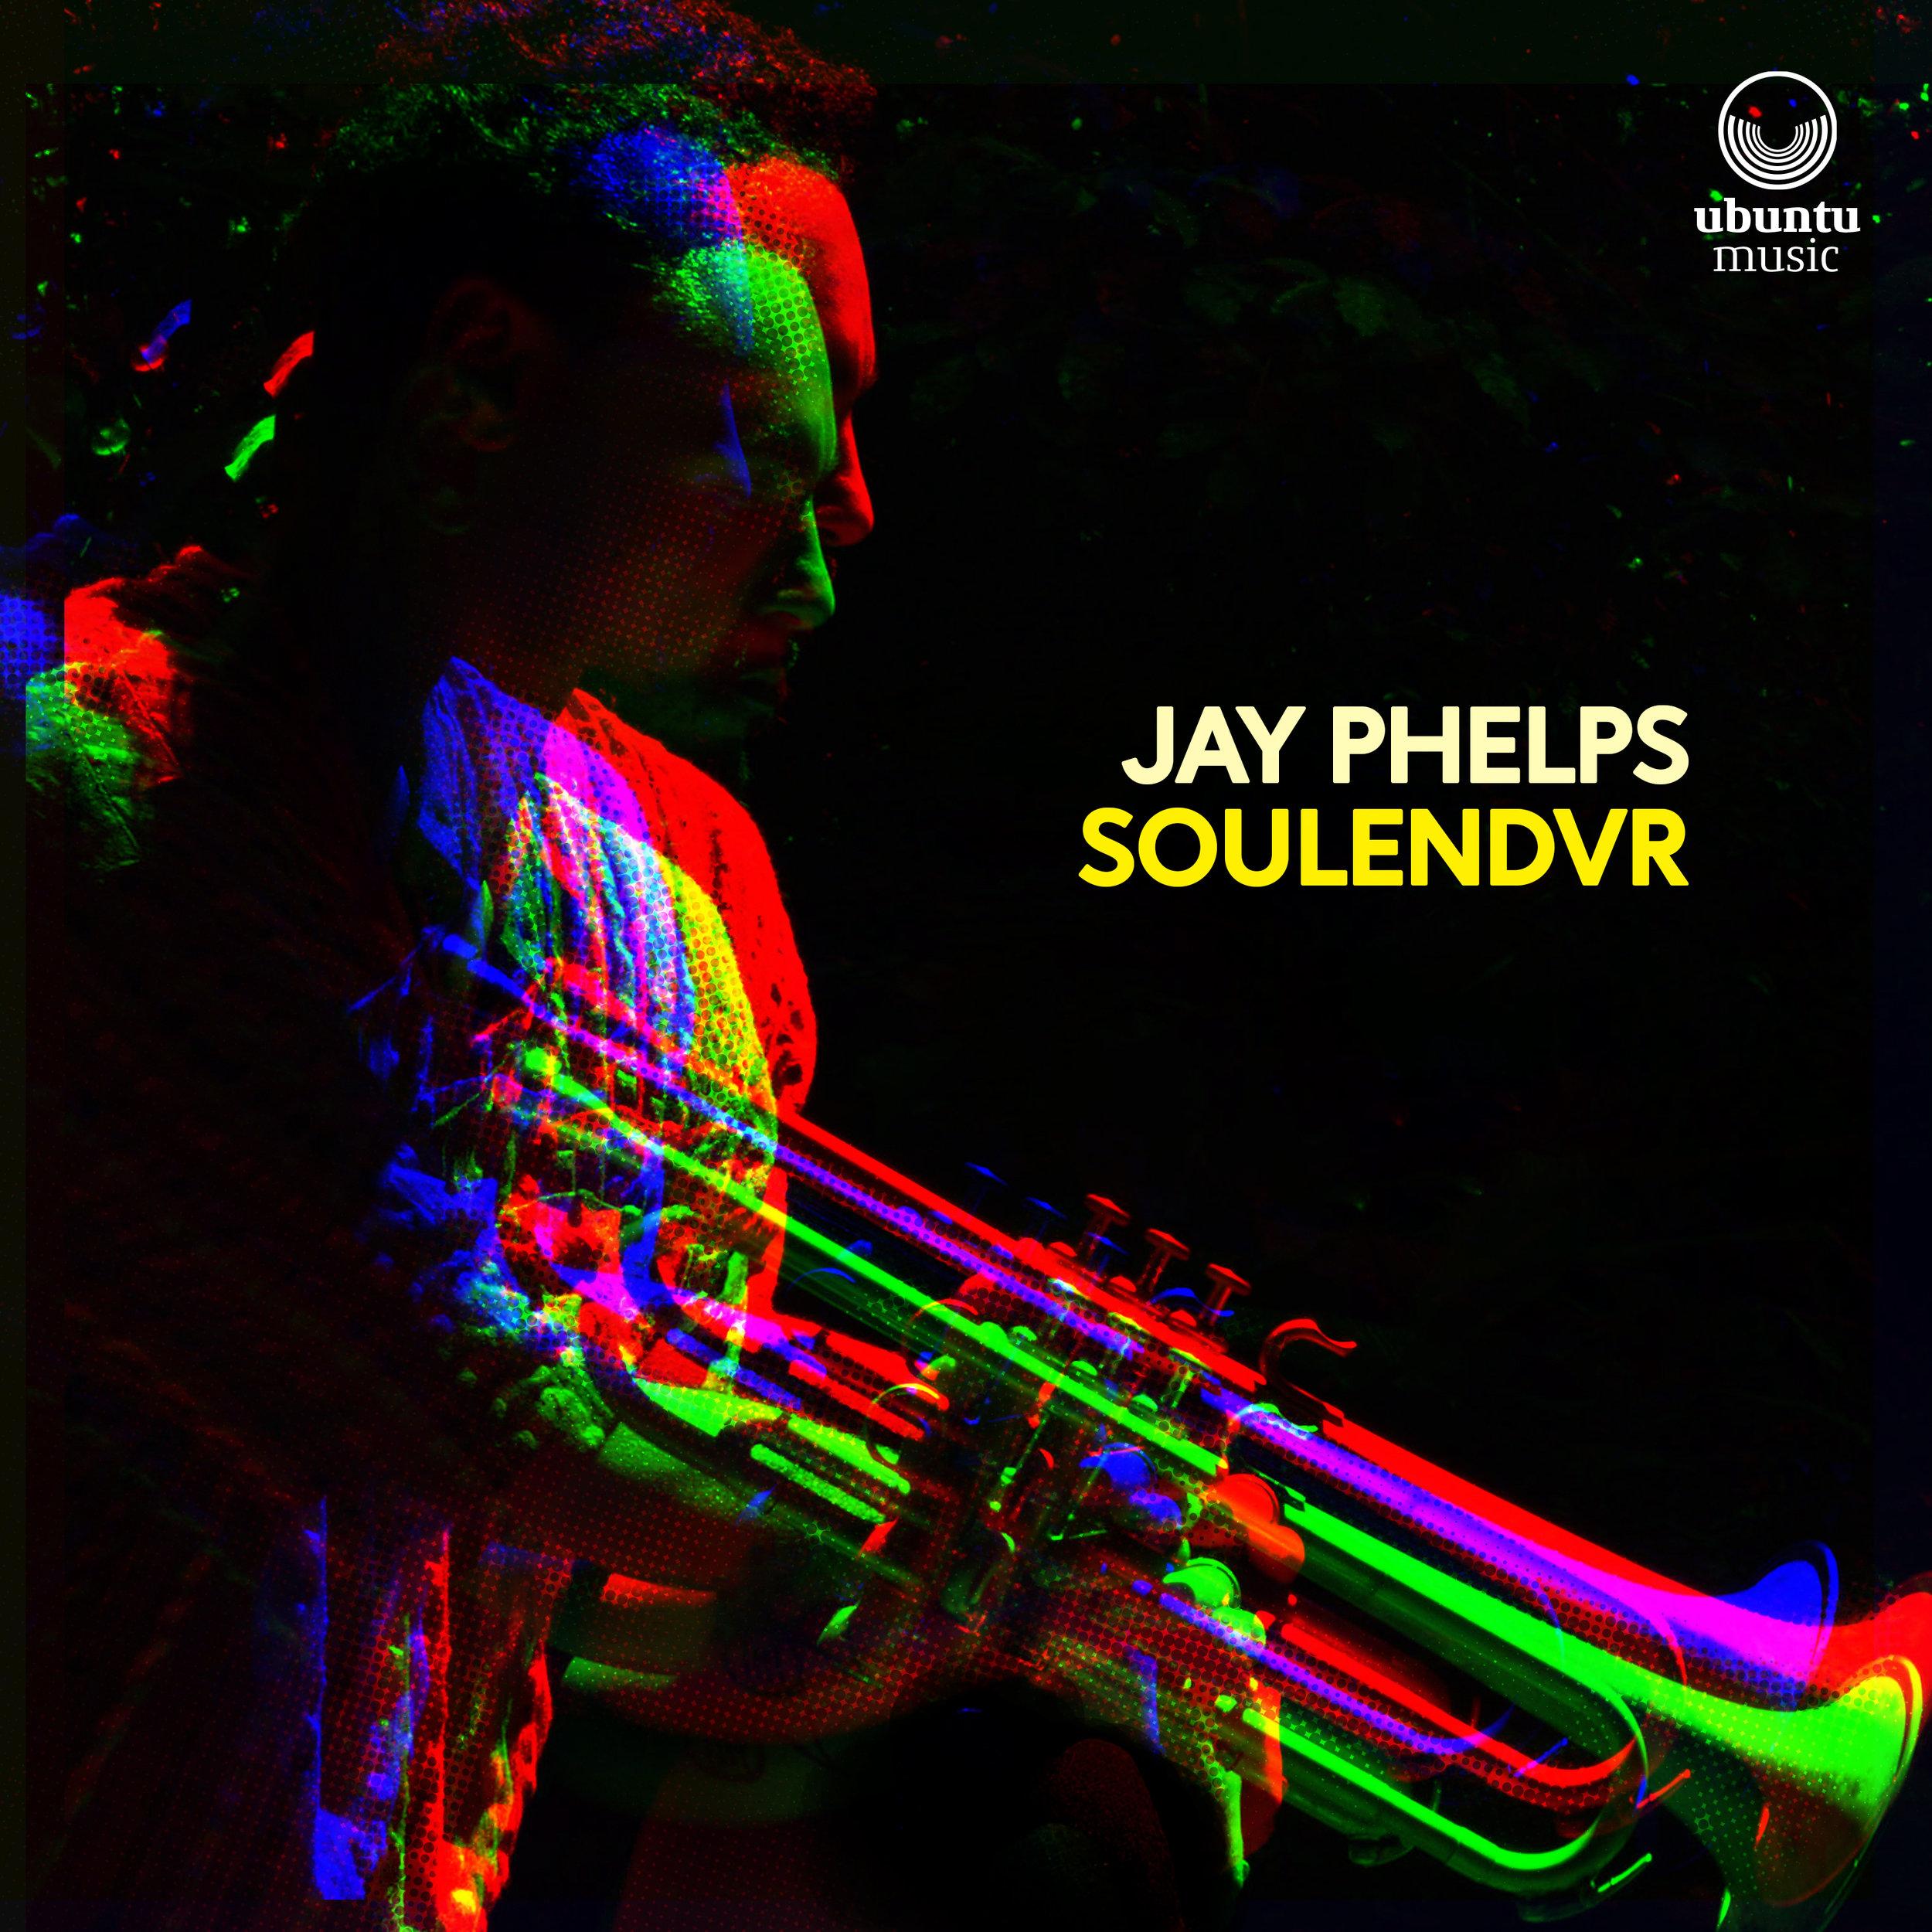 Jay Phelps / SoulEndvr